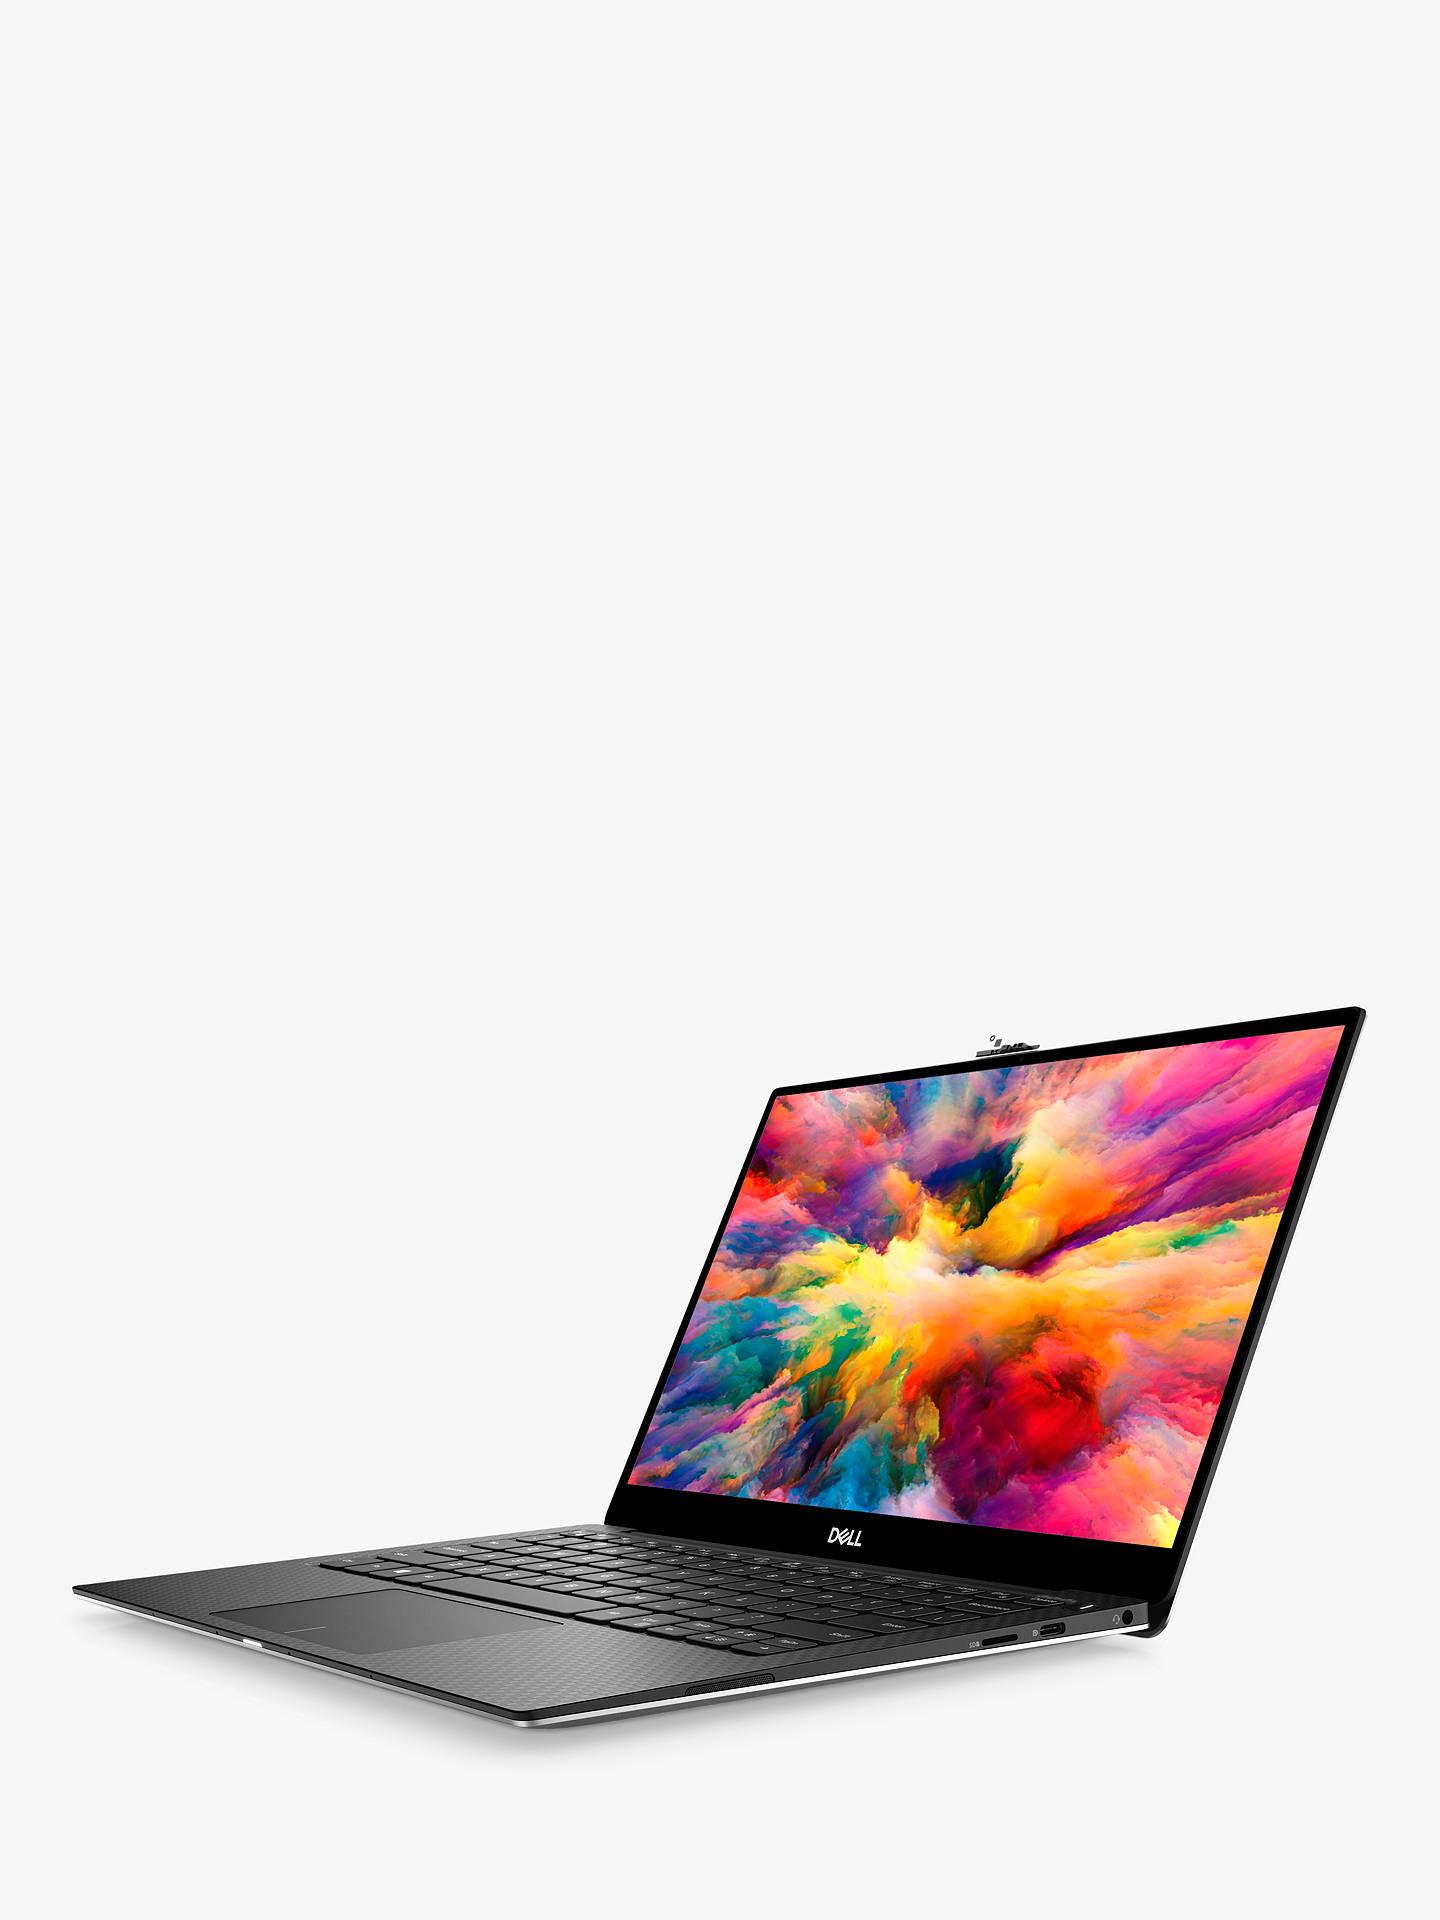 "Dell XPS 13 9380 Laptop, Intel Core i7 Processor, 16GB RAM, 512GB SSD,  13 3"" Ultra HD, Silver"